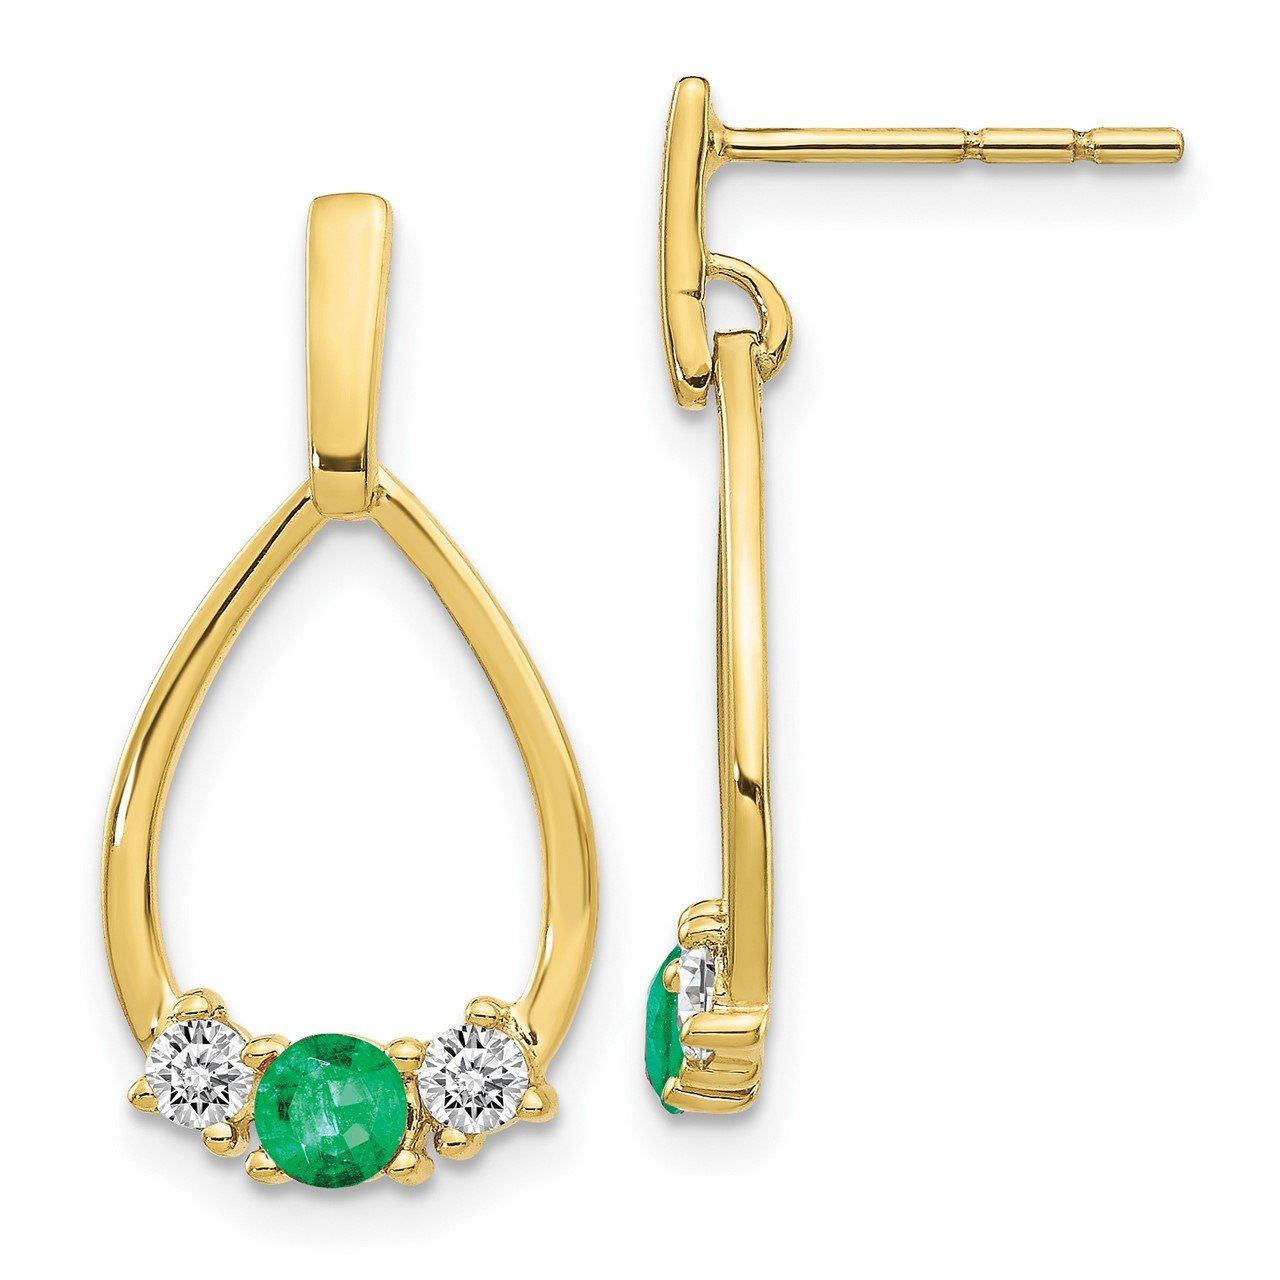 10k Emerald and White Sapphire Post Dangle Earrings